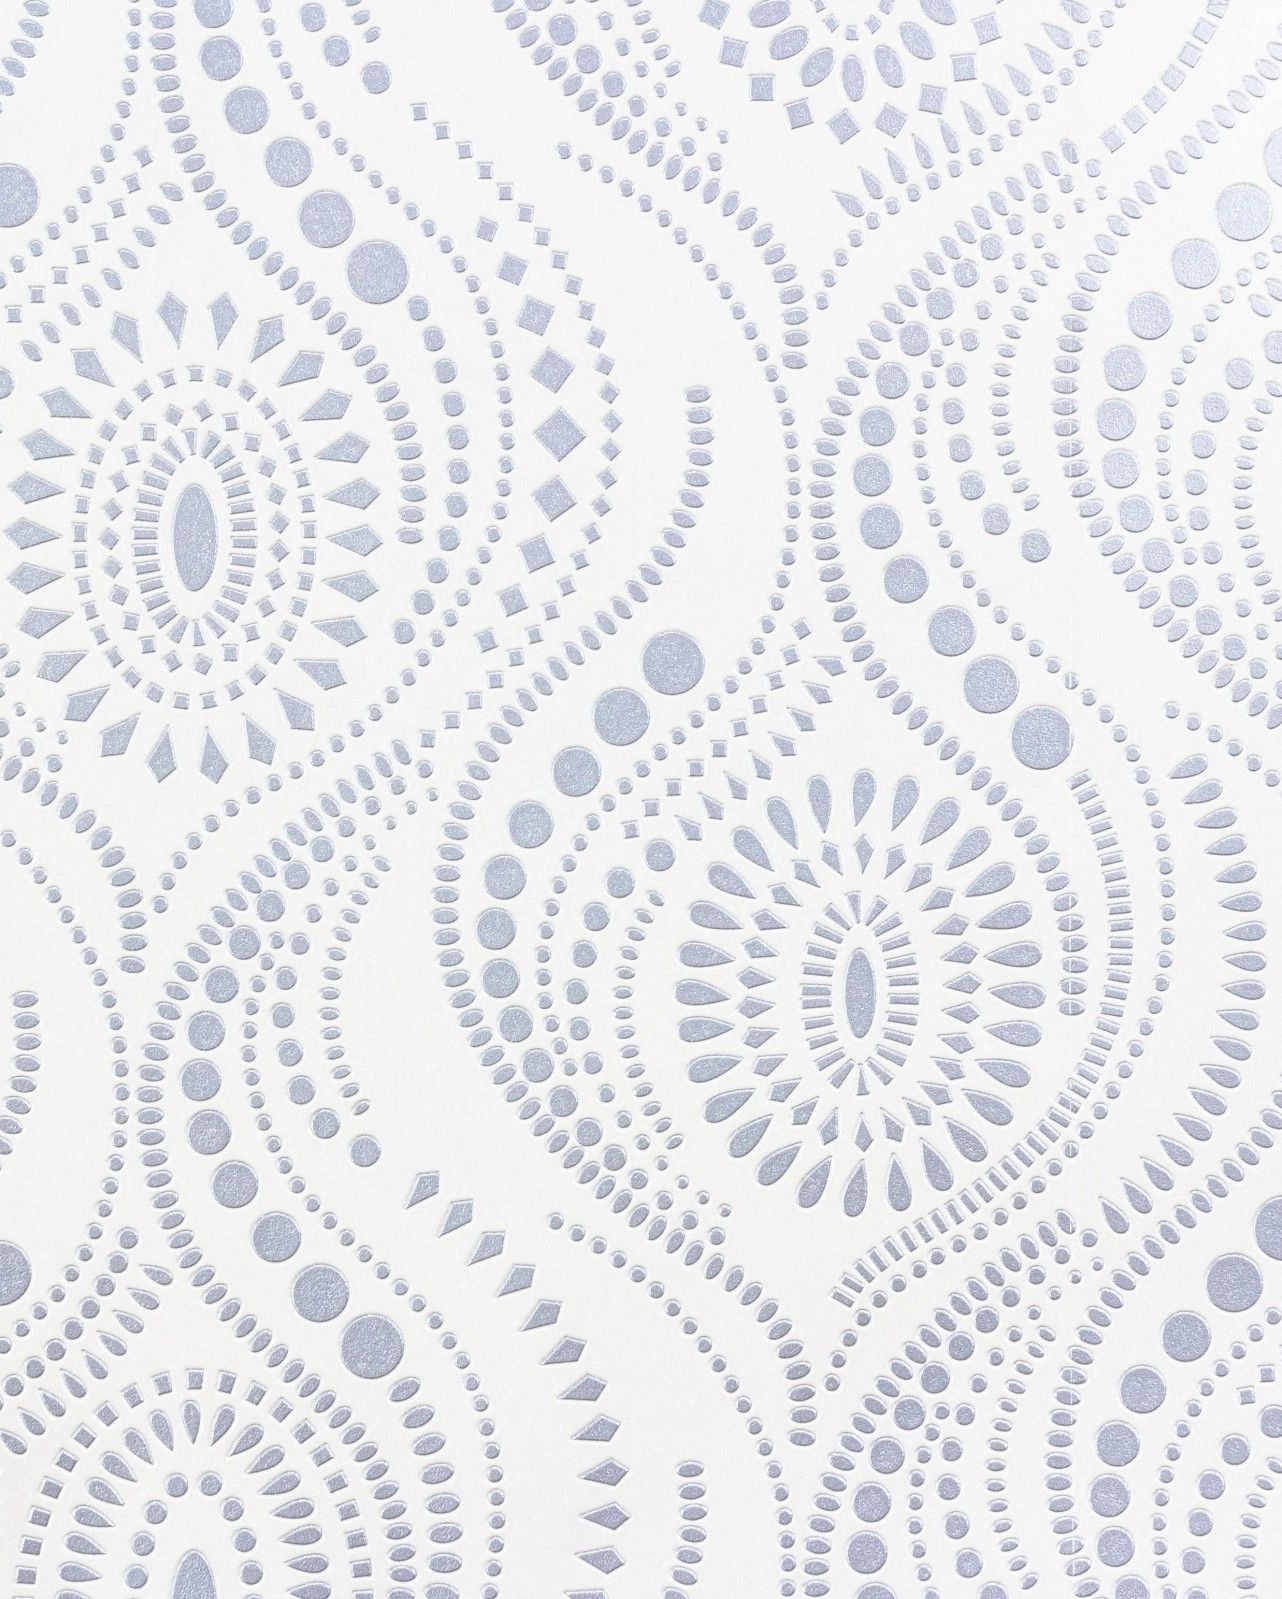 wallpaper Rasch vinyl wallpaper Aqua Relief pattern white